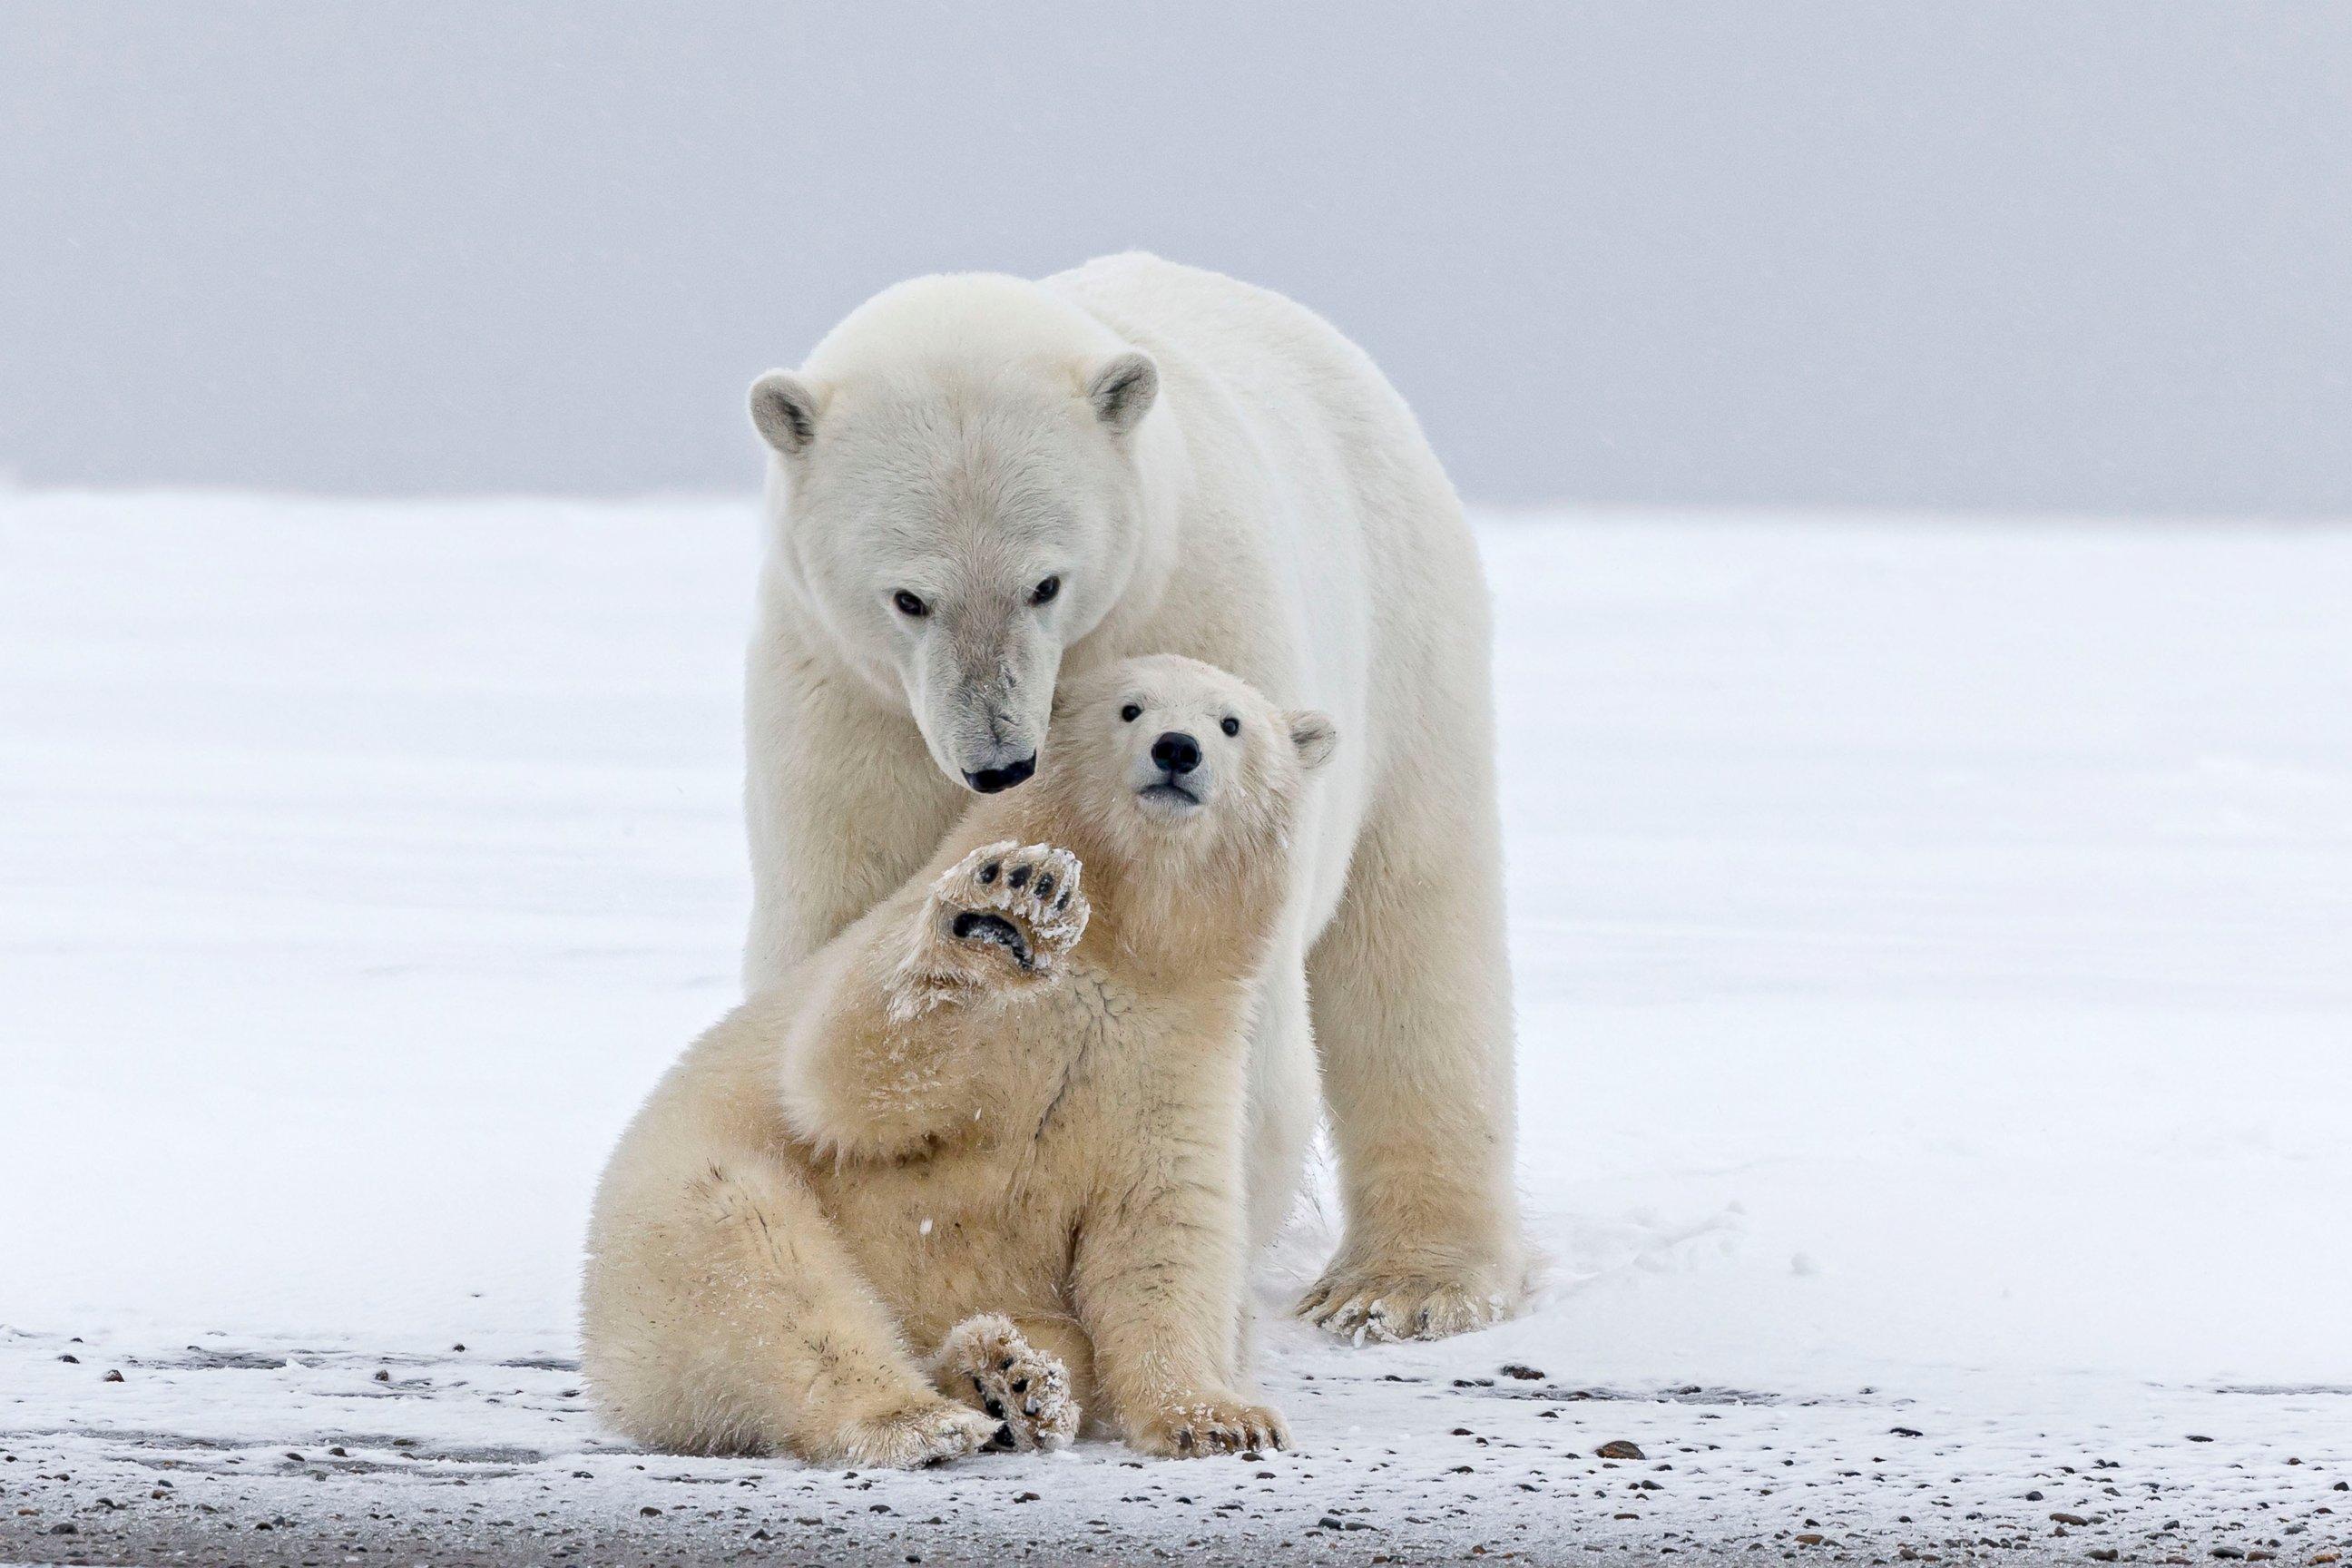 Playful Polar Bear Chills with Mom